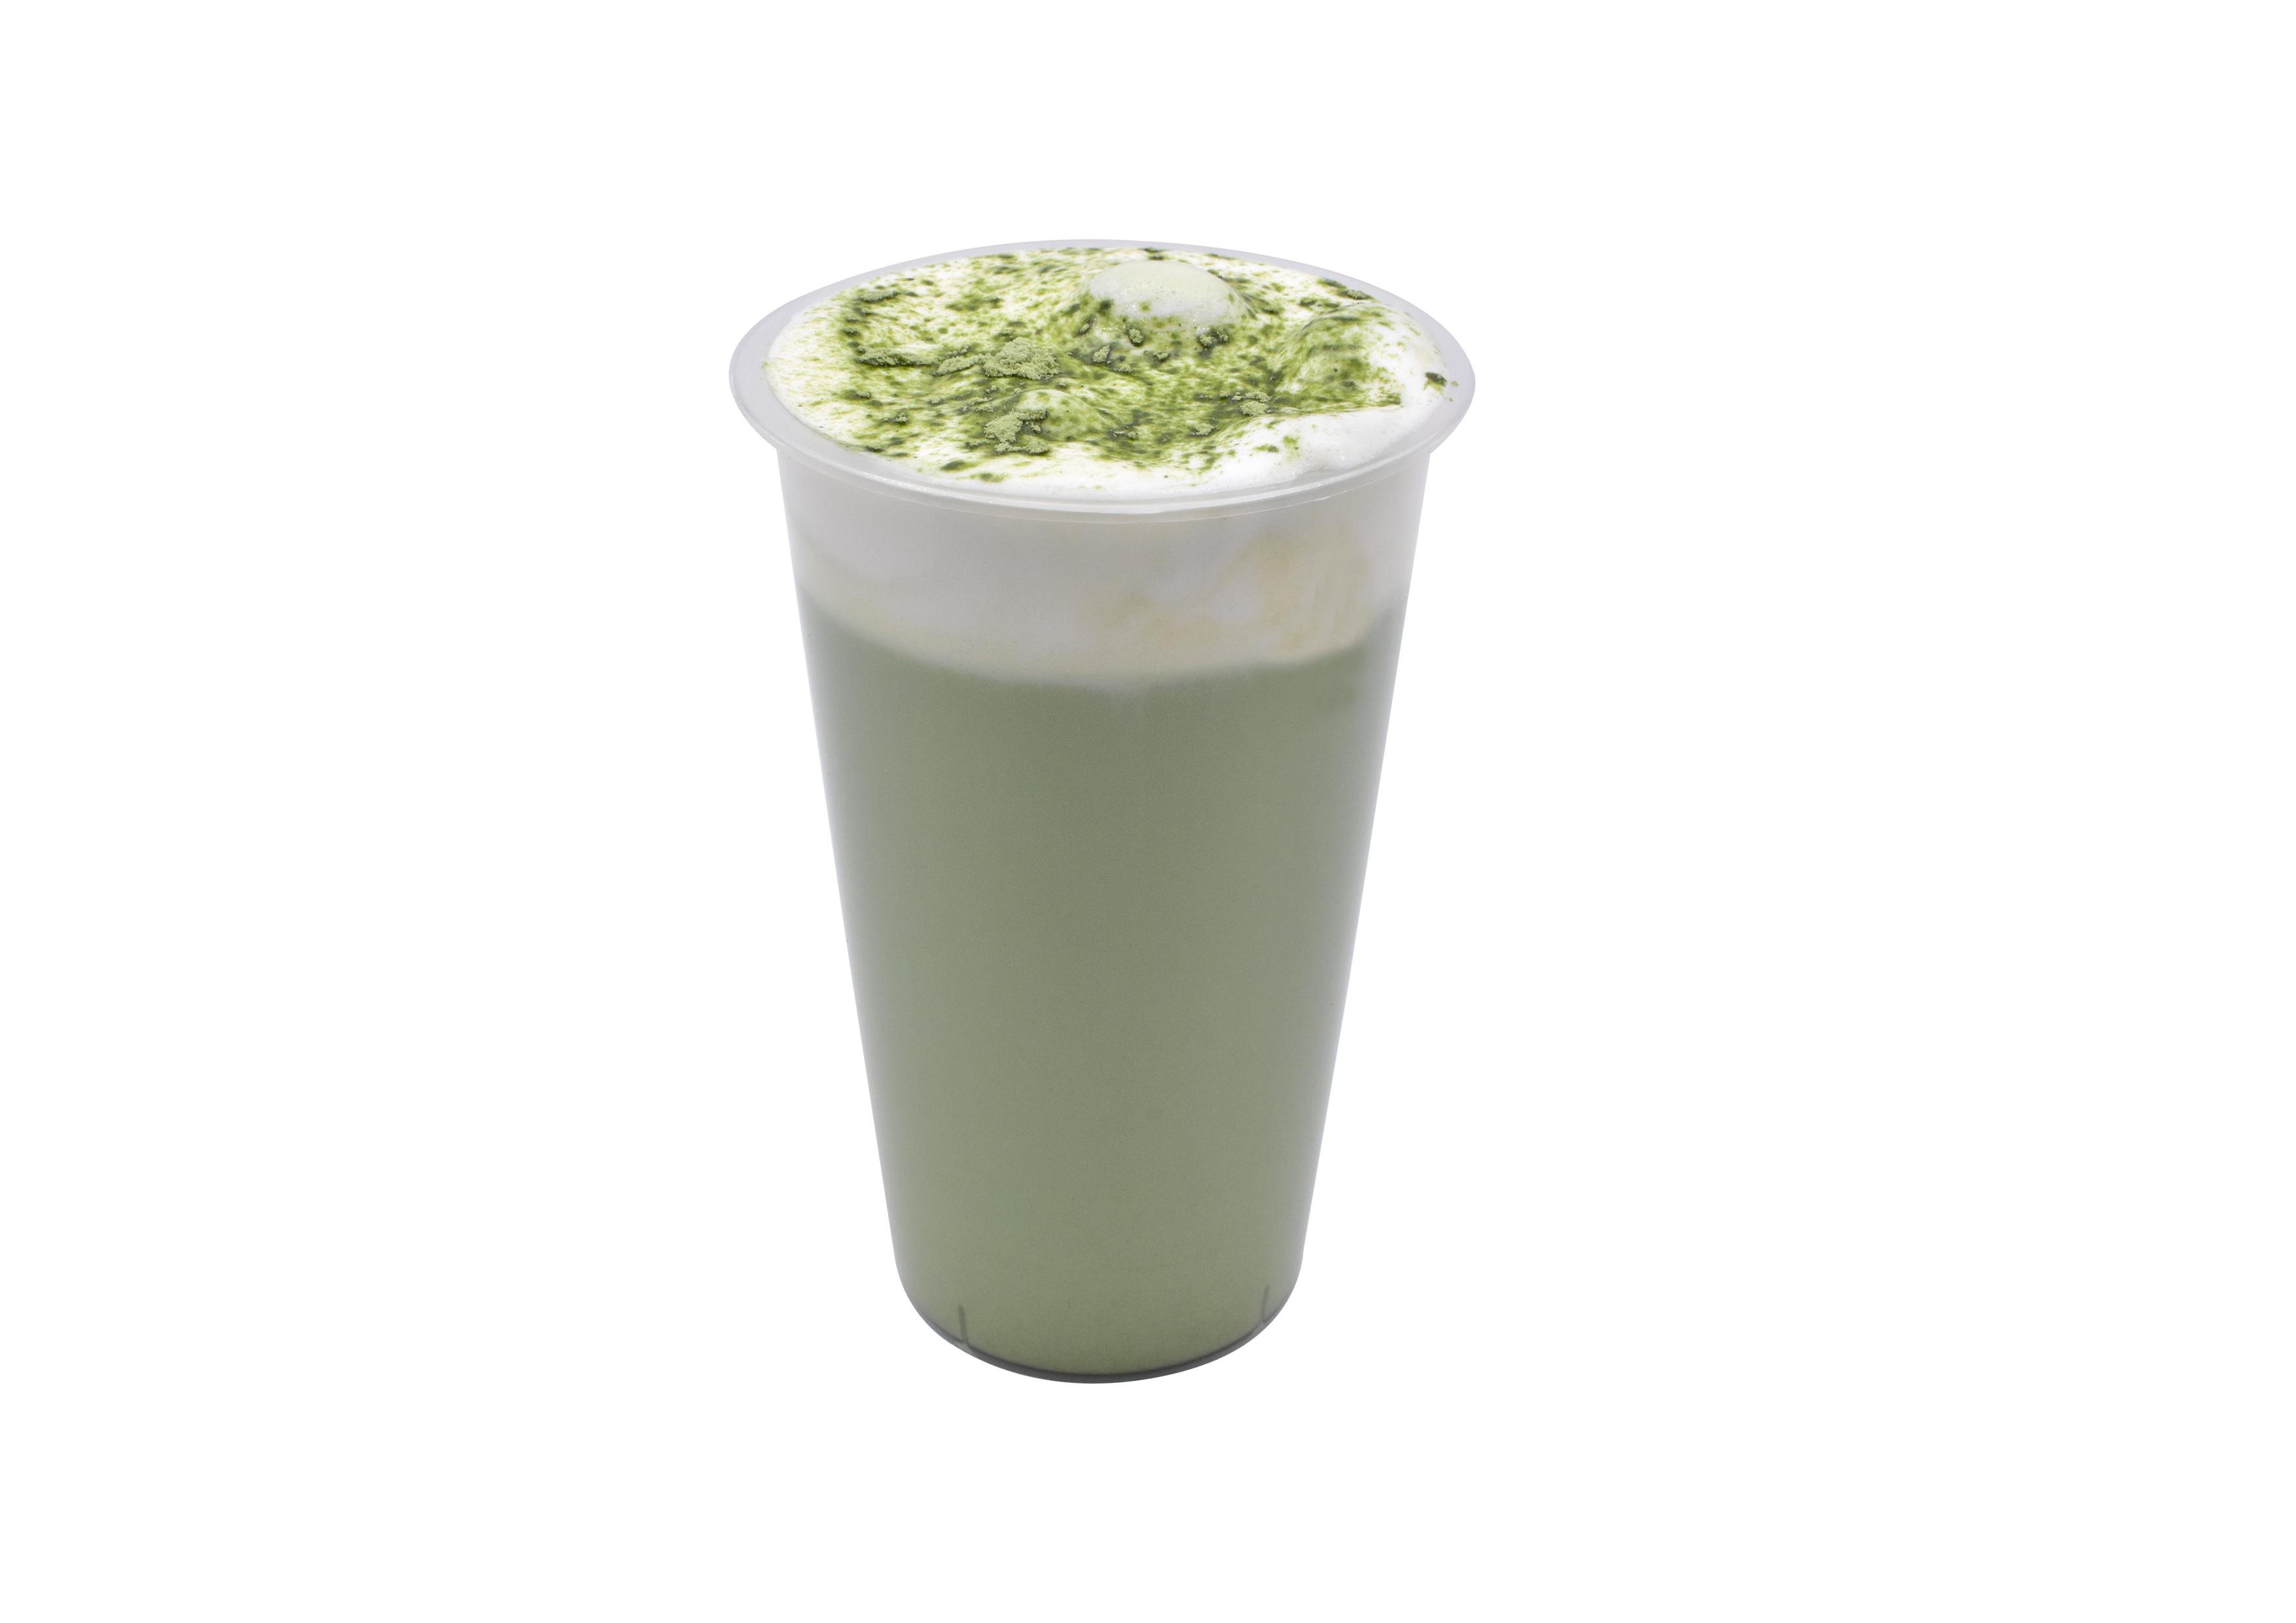 抹茶奶绿(Matcha milk green)